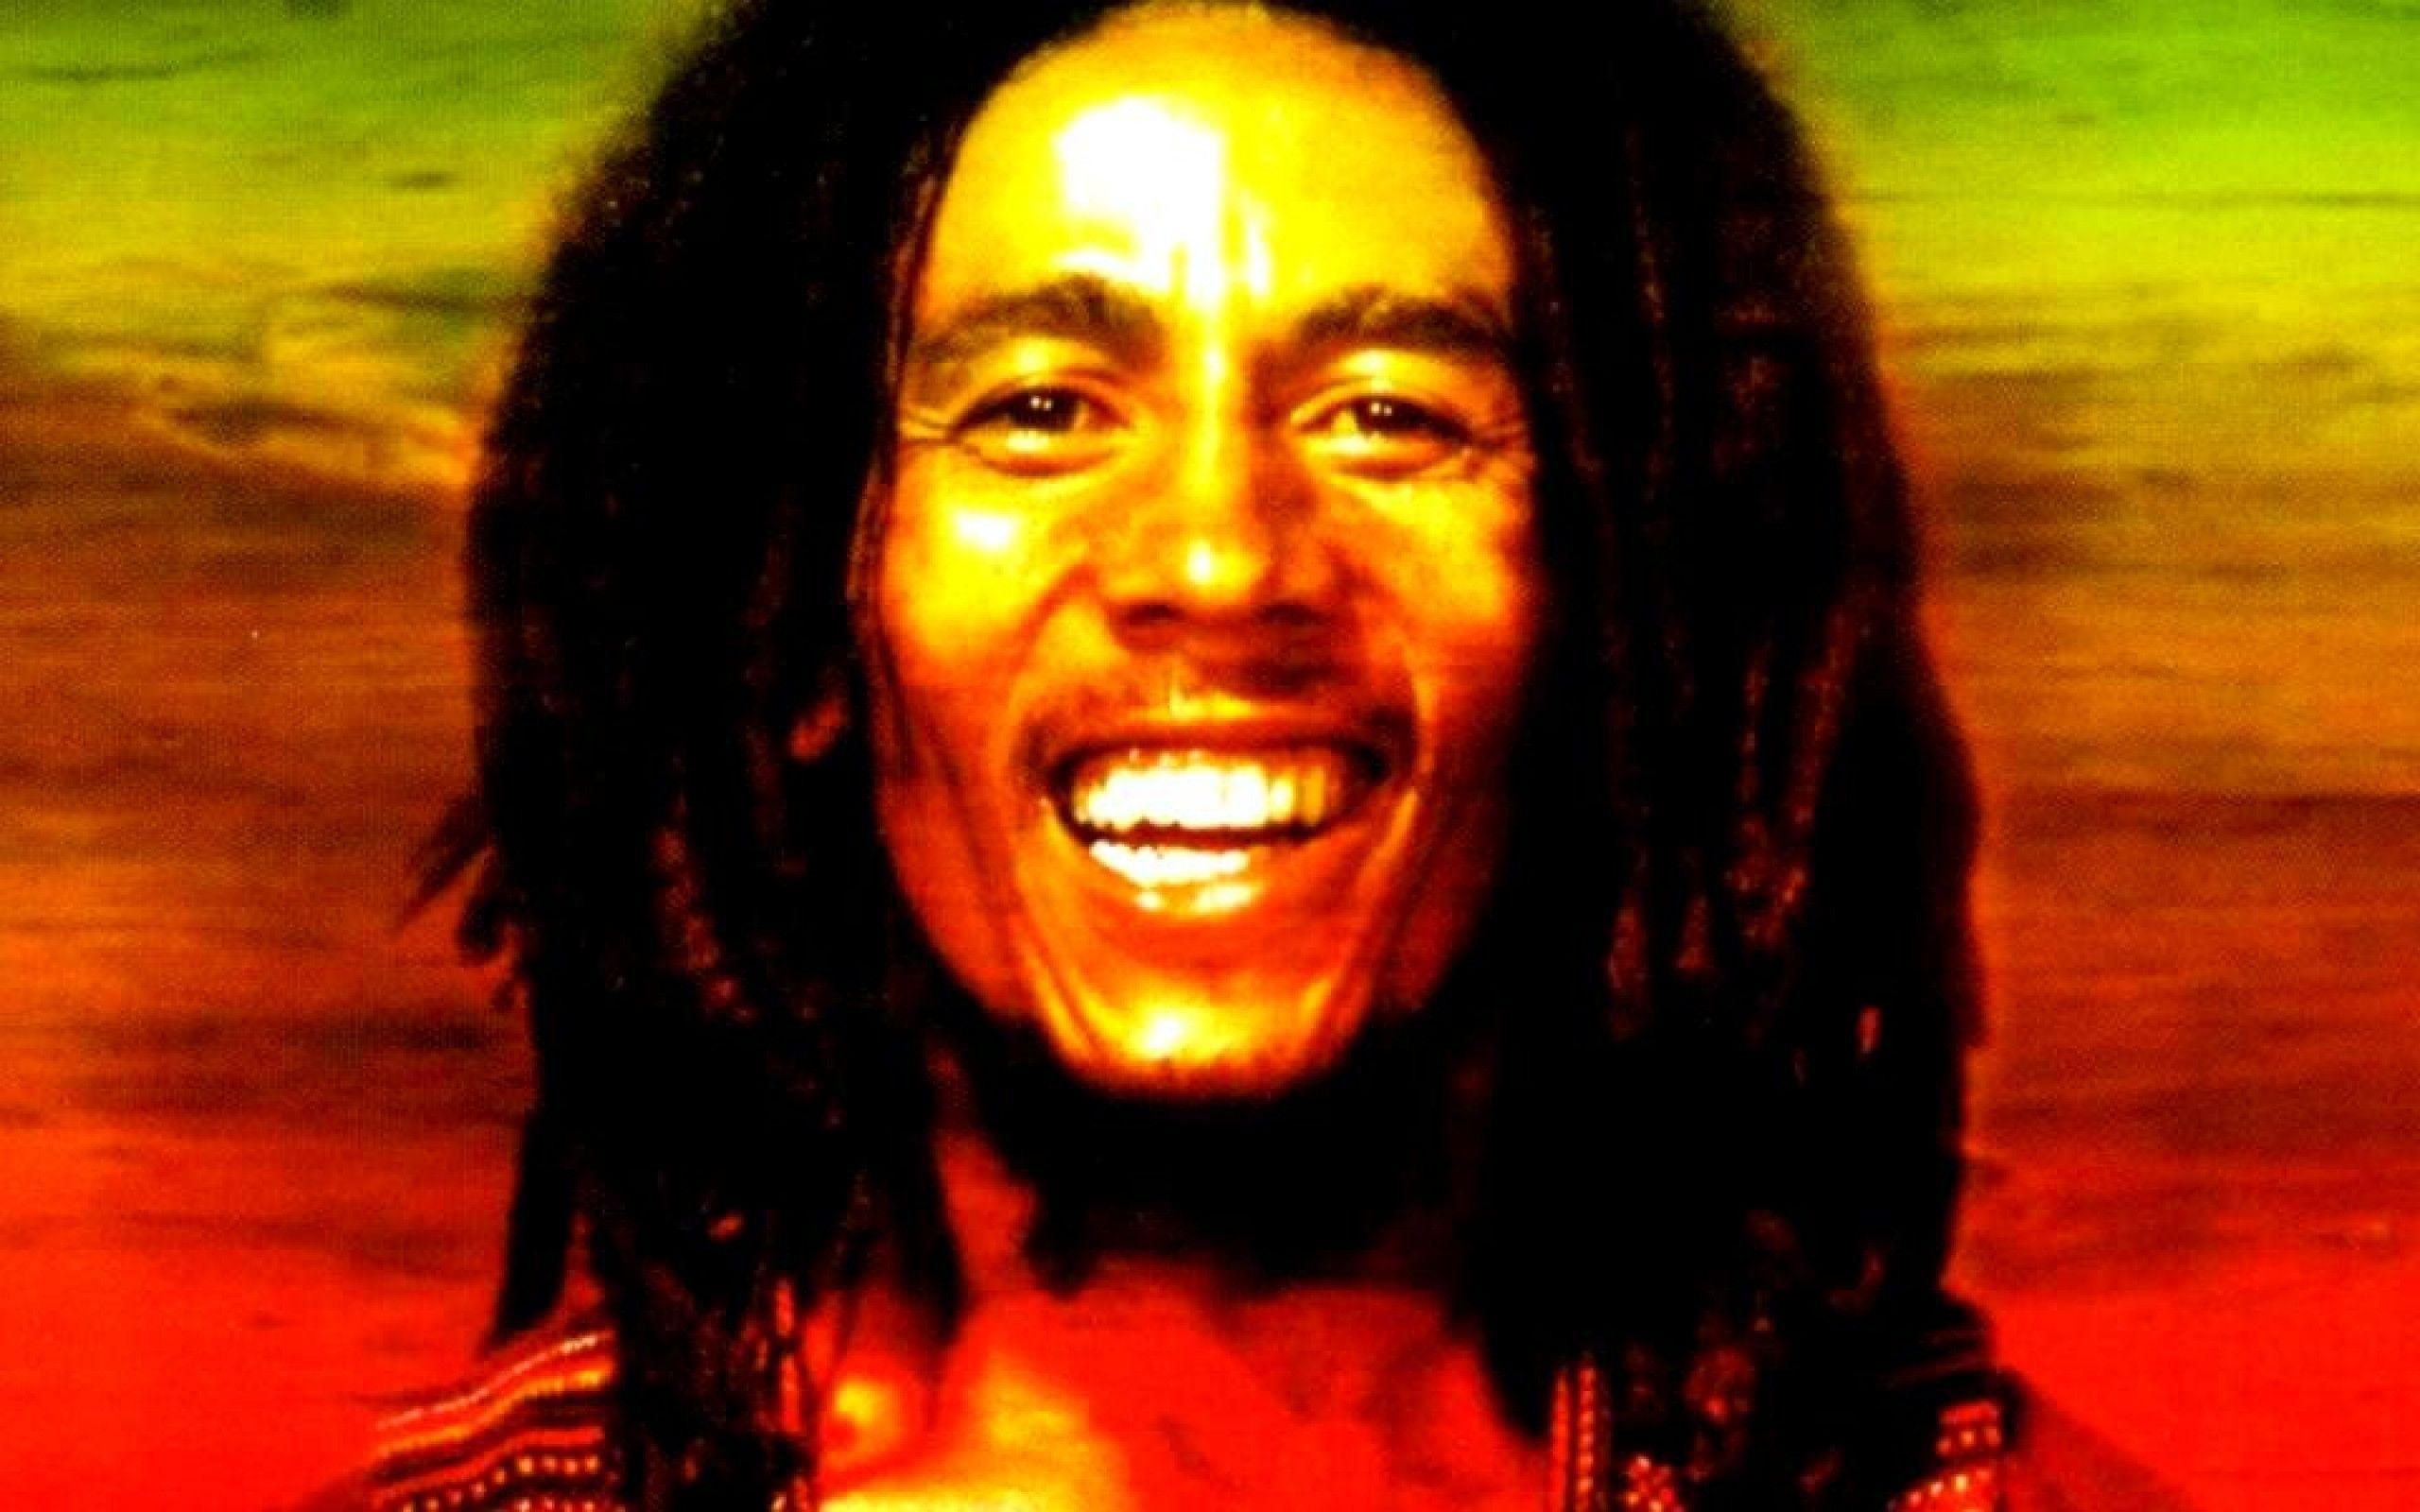 Bob Marley Wallpaper Background #7141 Wallpaper | HDwallsize.